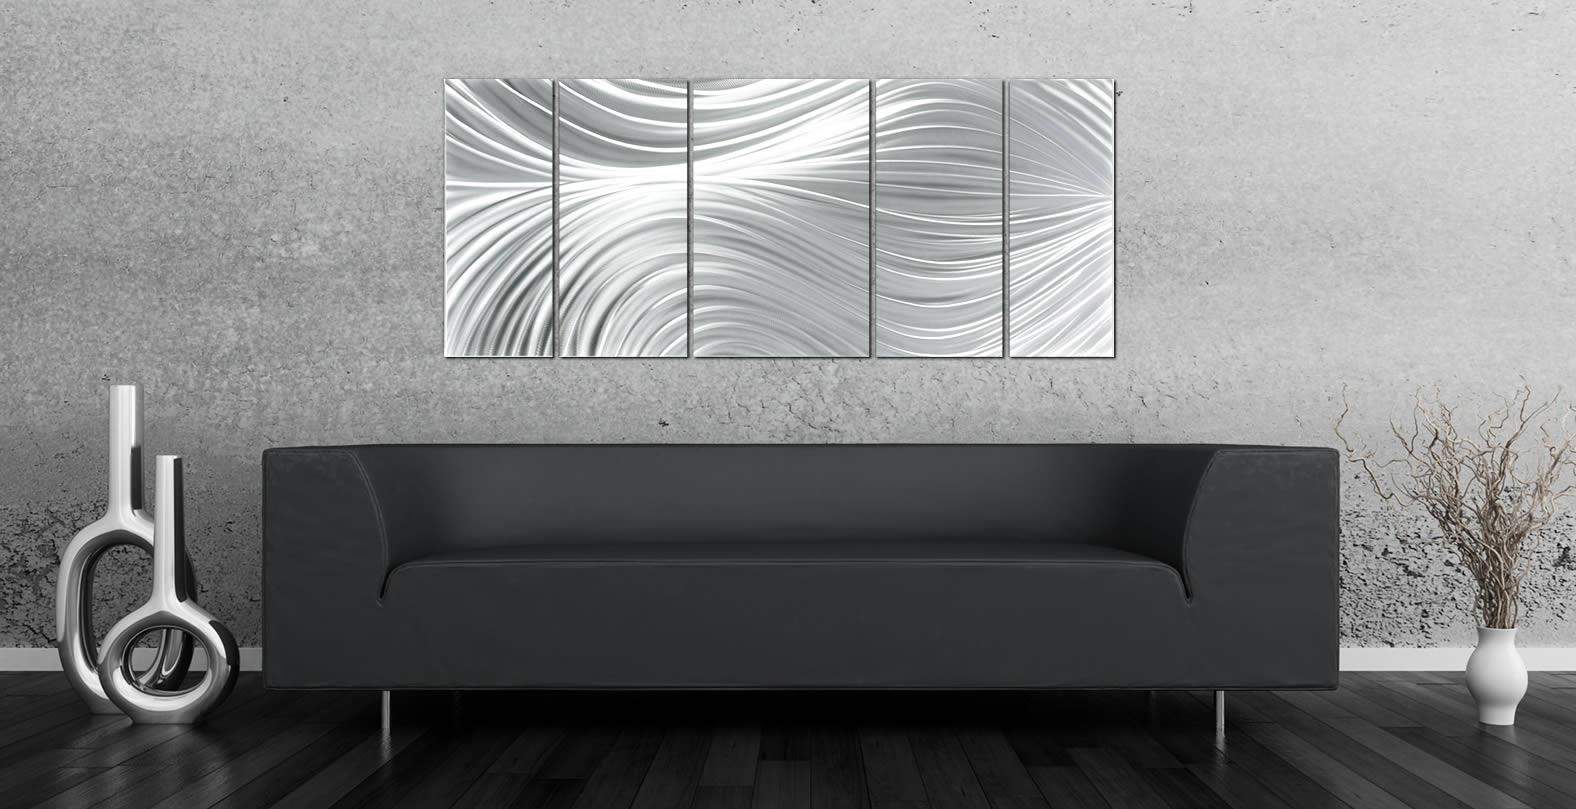 NY0289M - Metal Art by Nicholas Yust, Alternate Angle 8